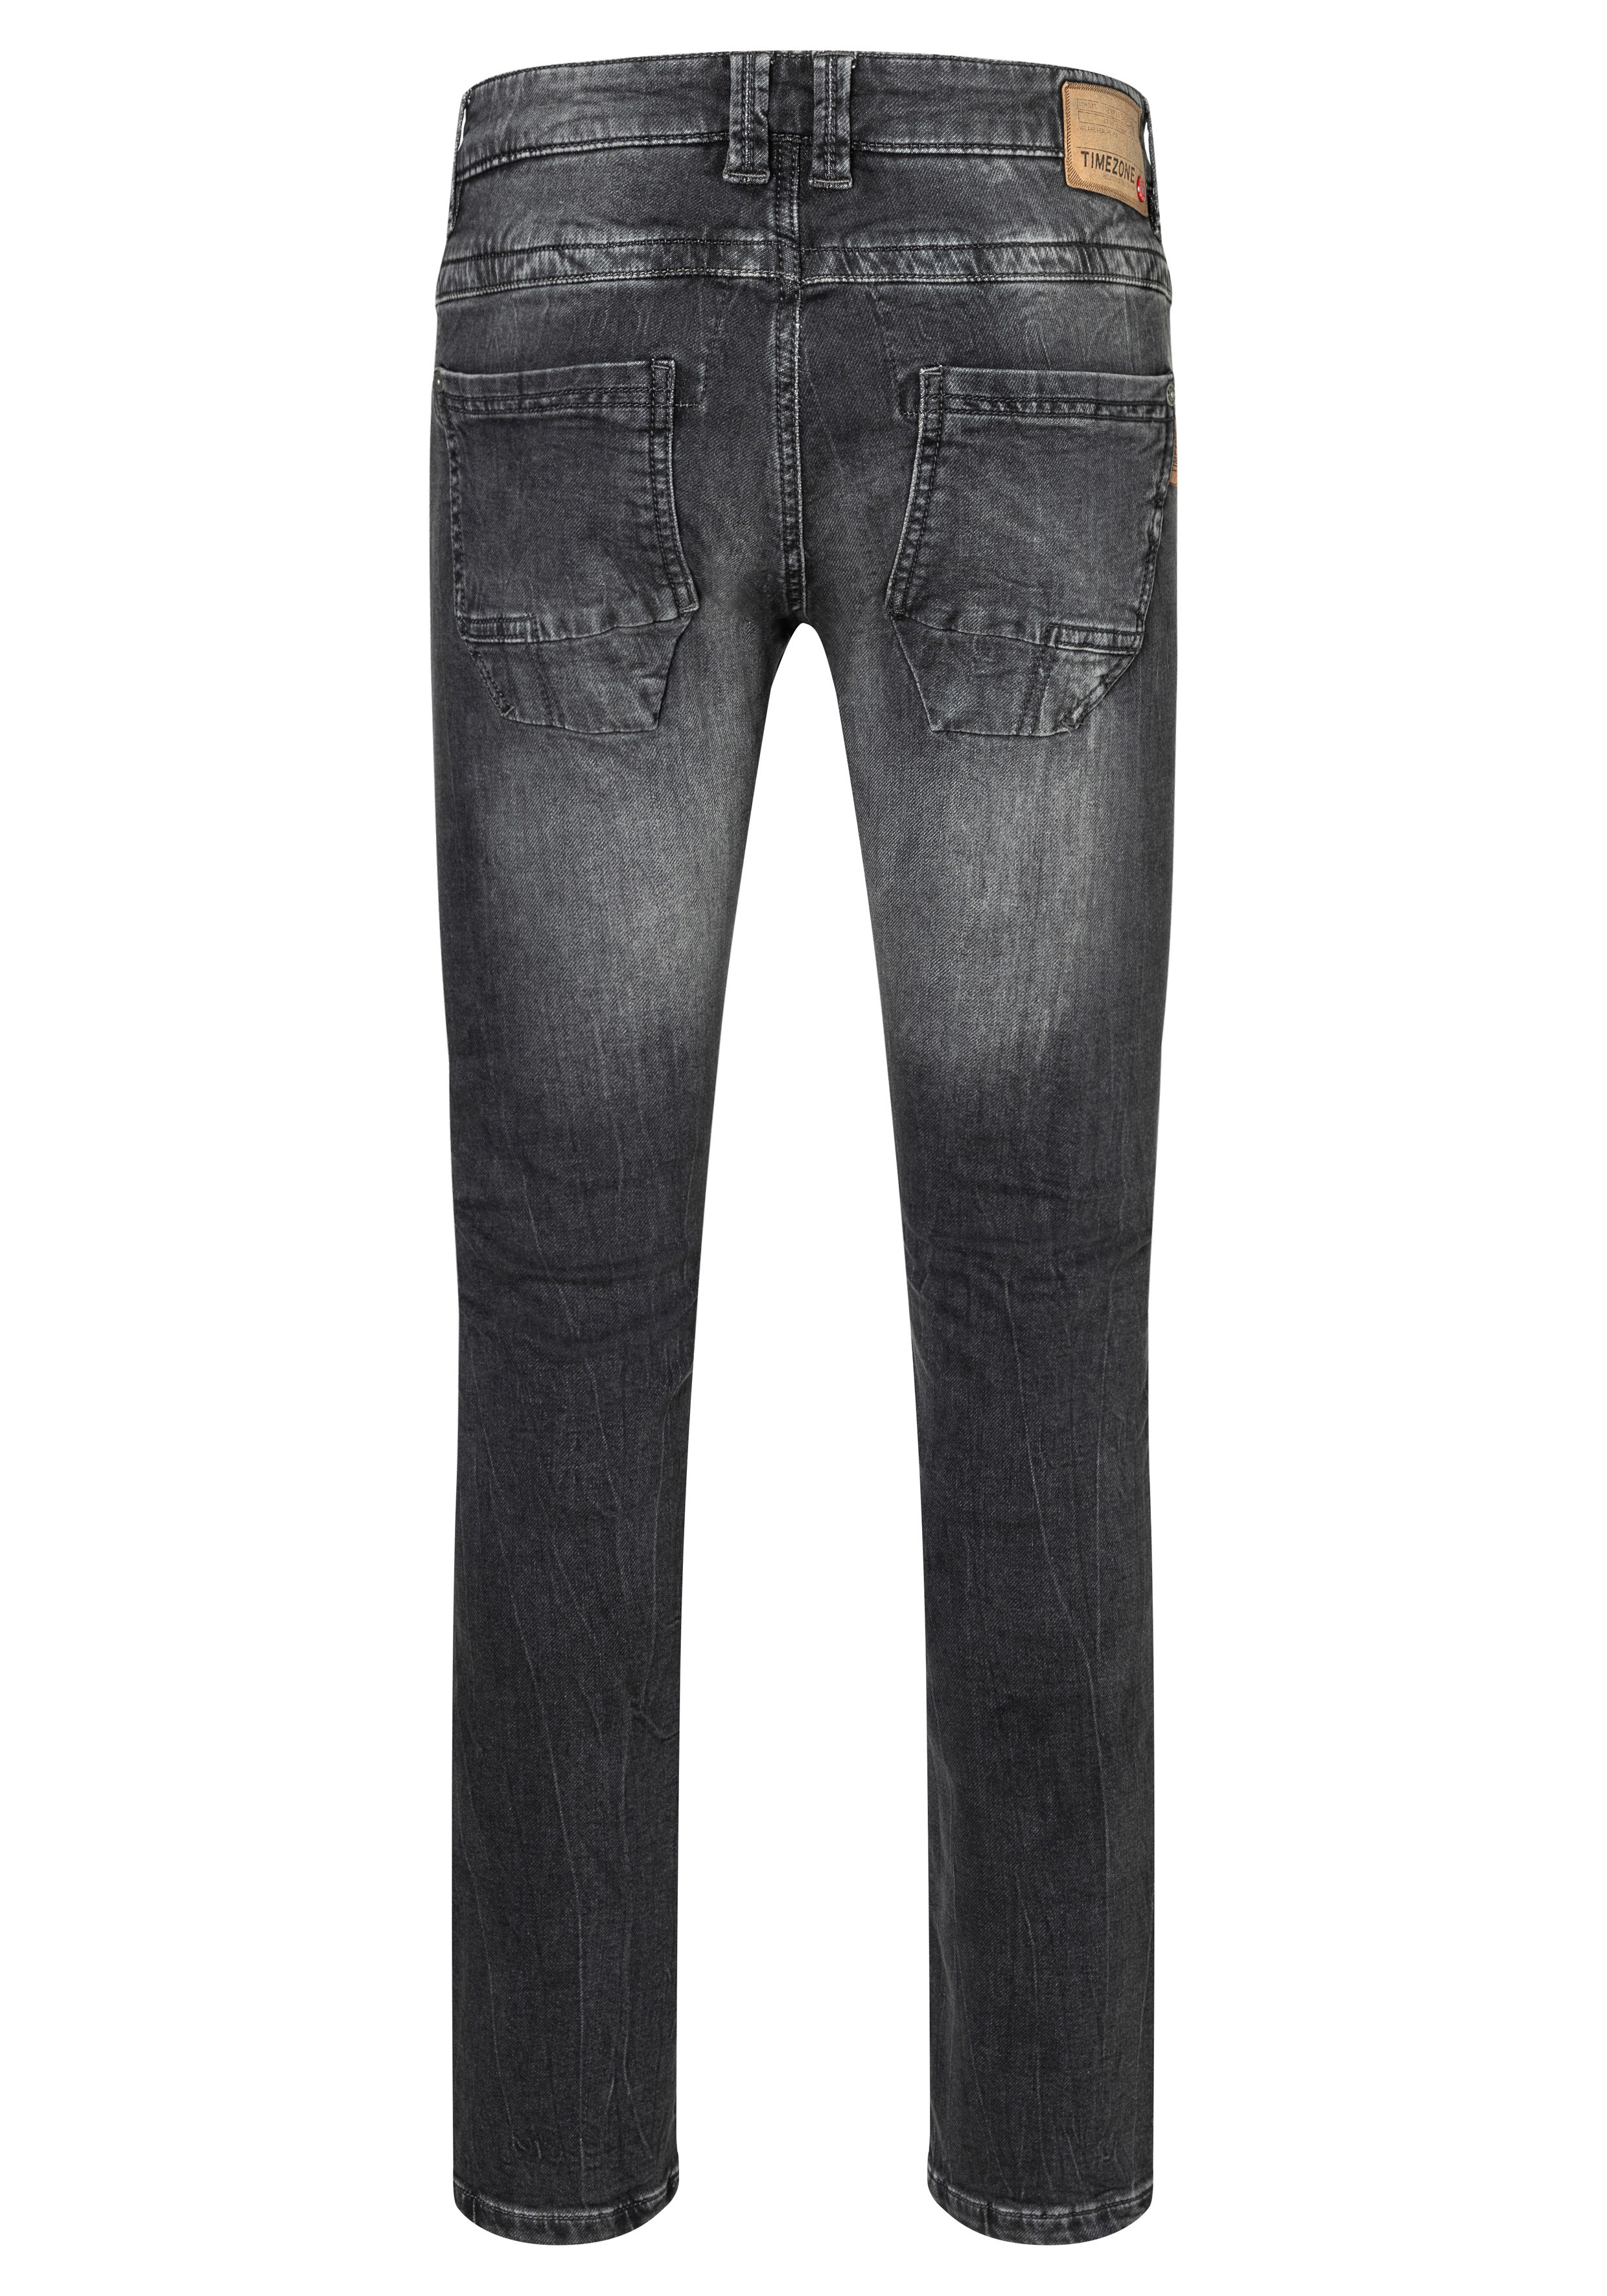 Timezone Jeans Edward